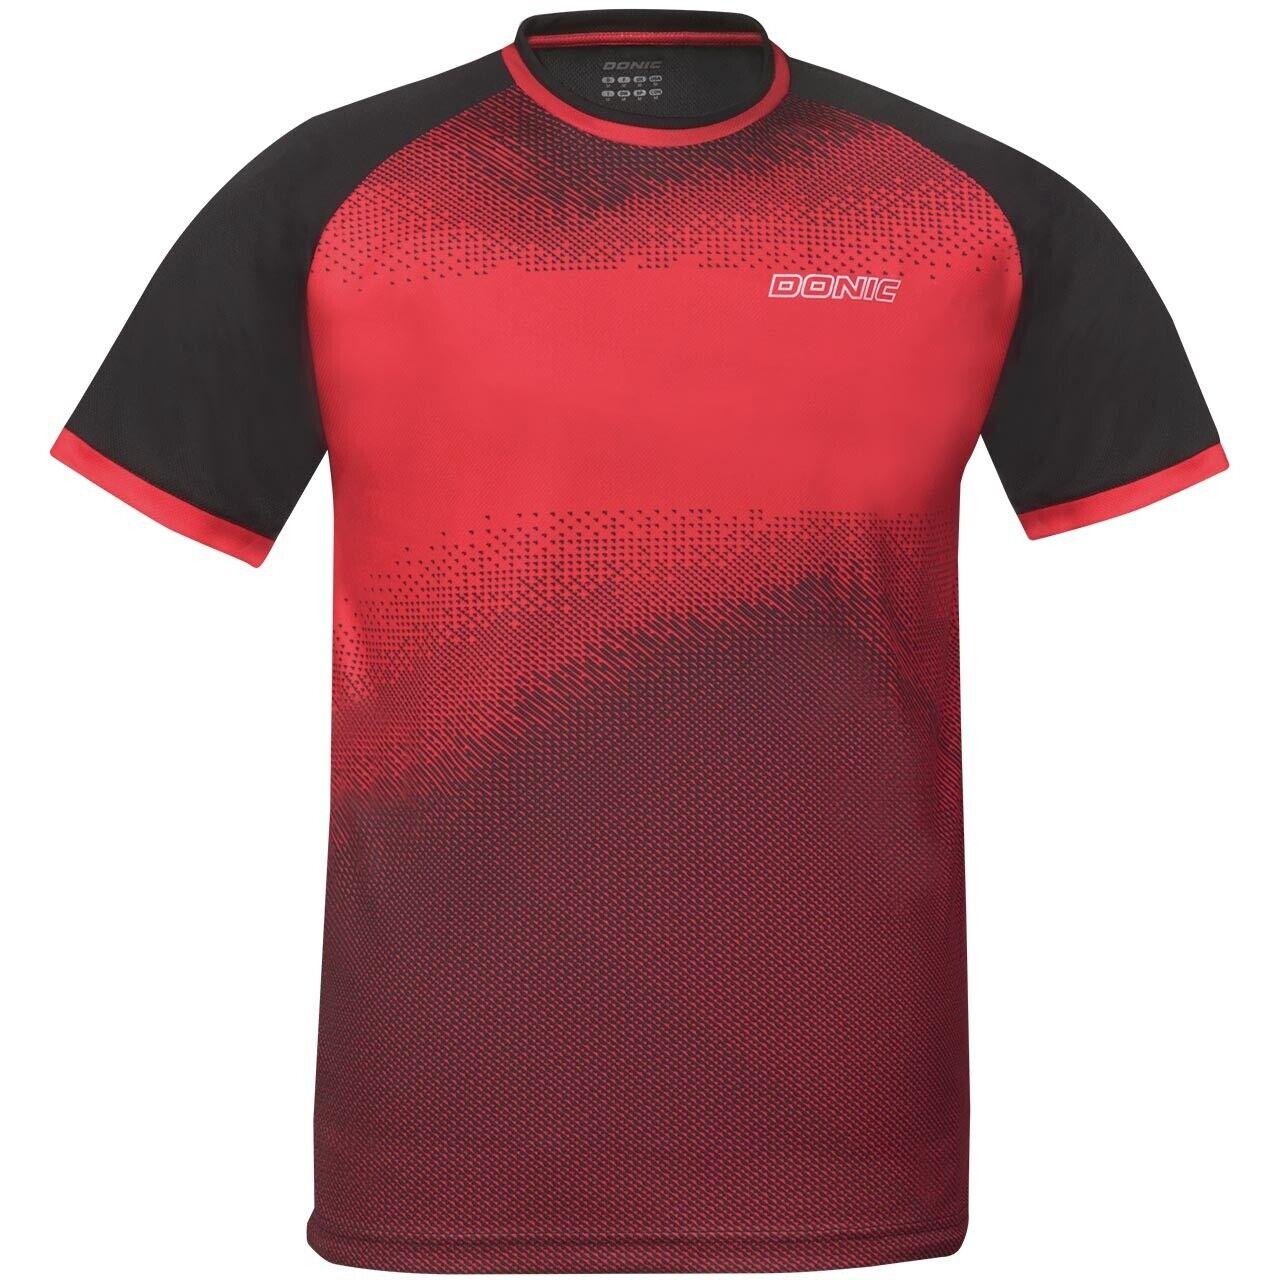 Donic Camiseta Agile red Transpirable Camiseta Bádminton Tenis de Mesa Camiseta